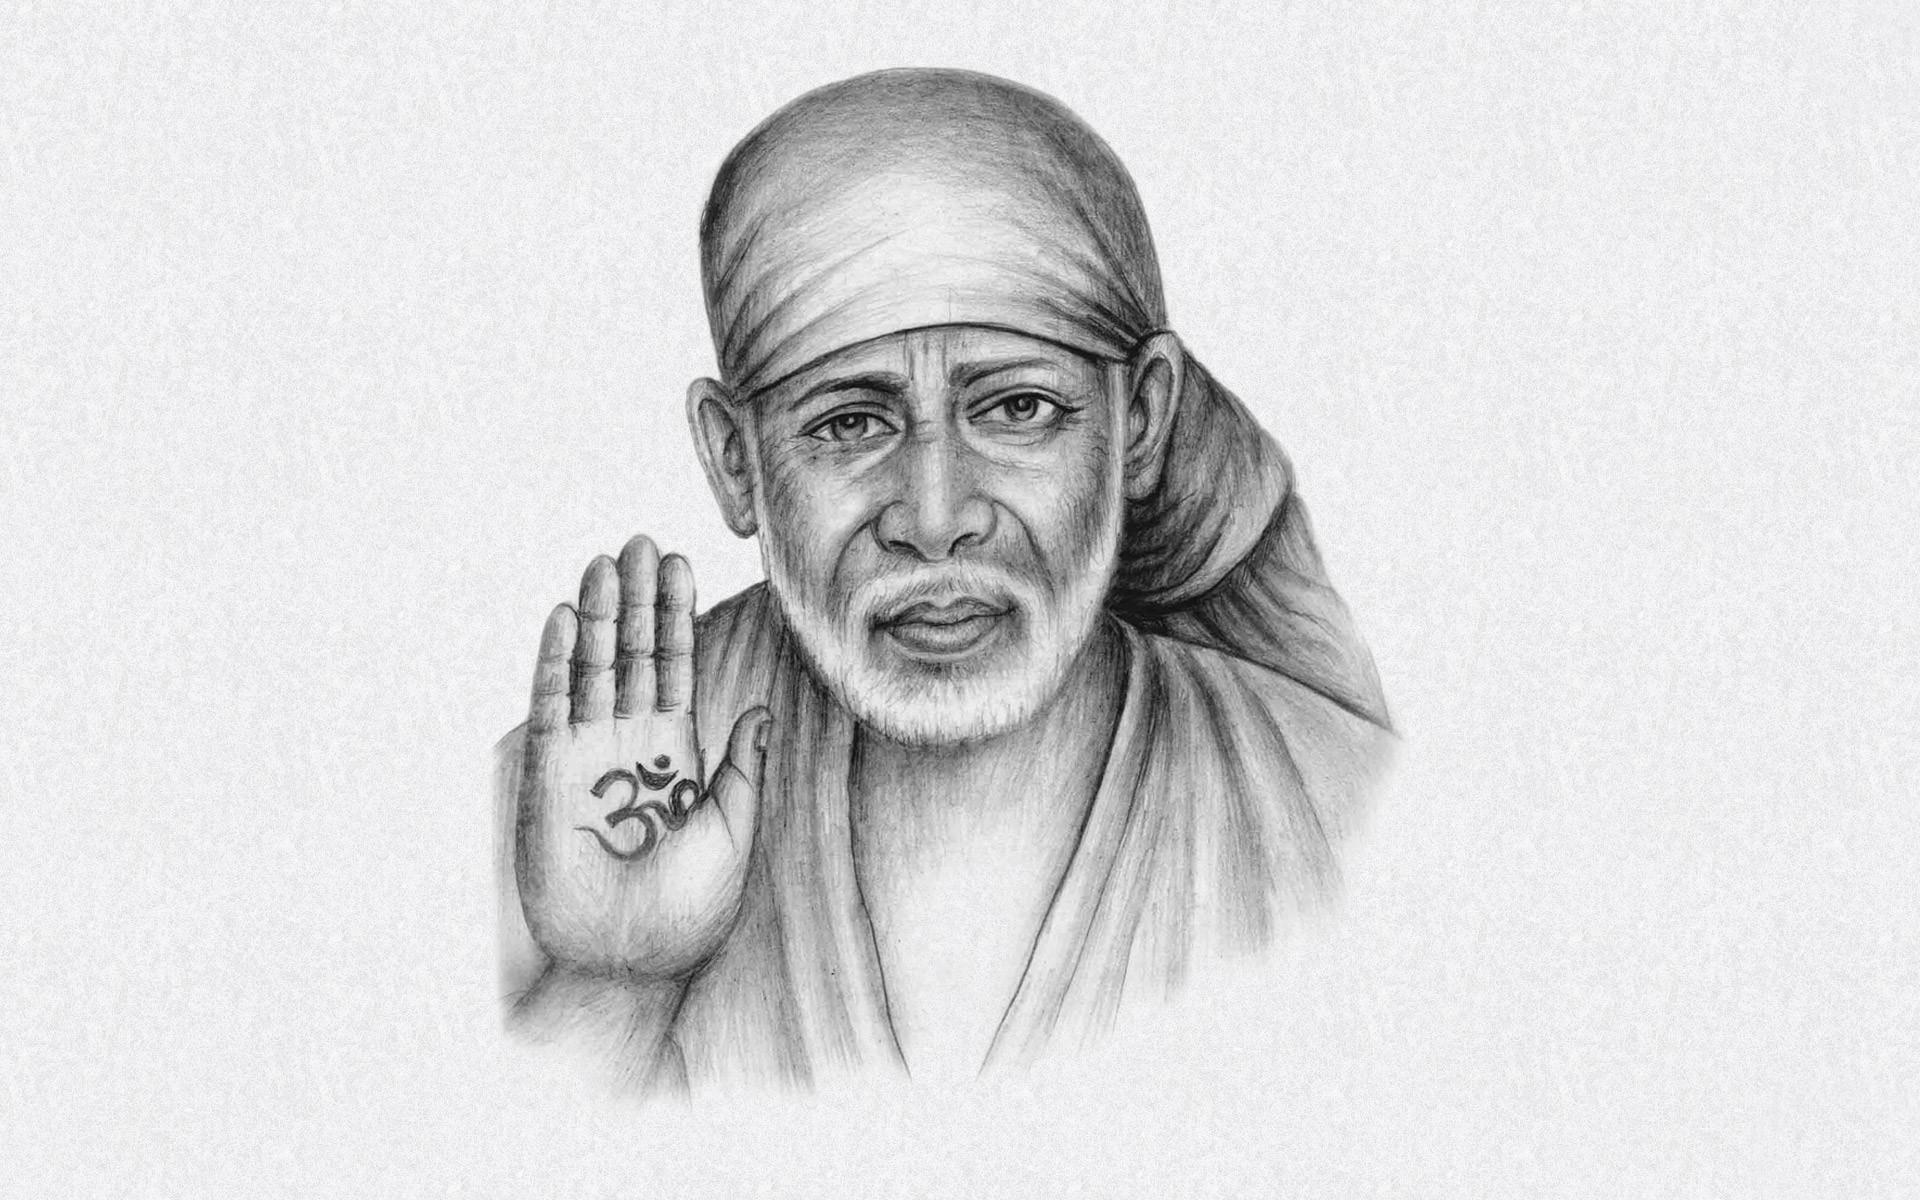 Sai Baba Wallpapers - Top Free Sai Baba Backgrounds